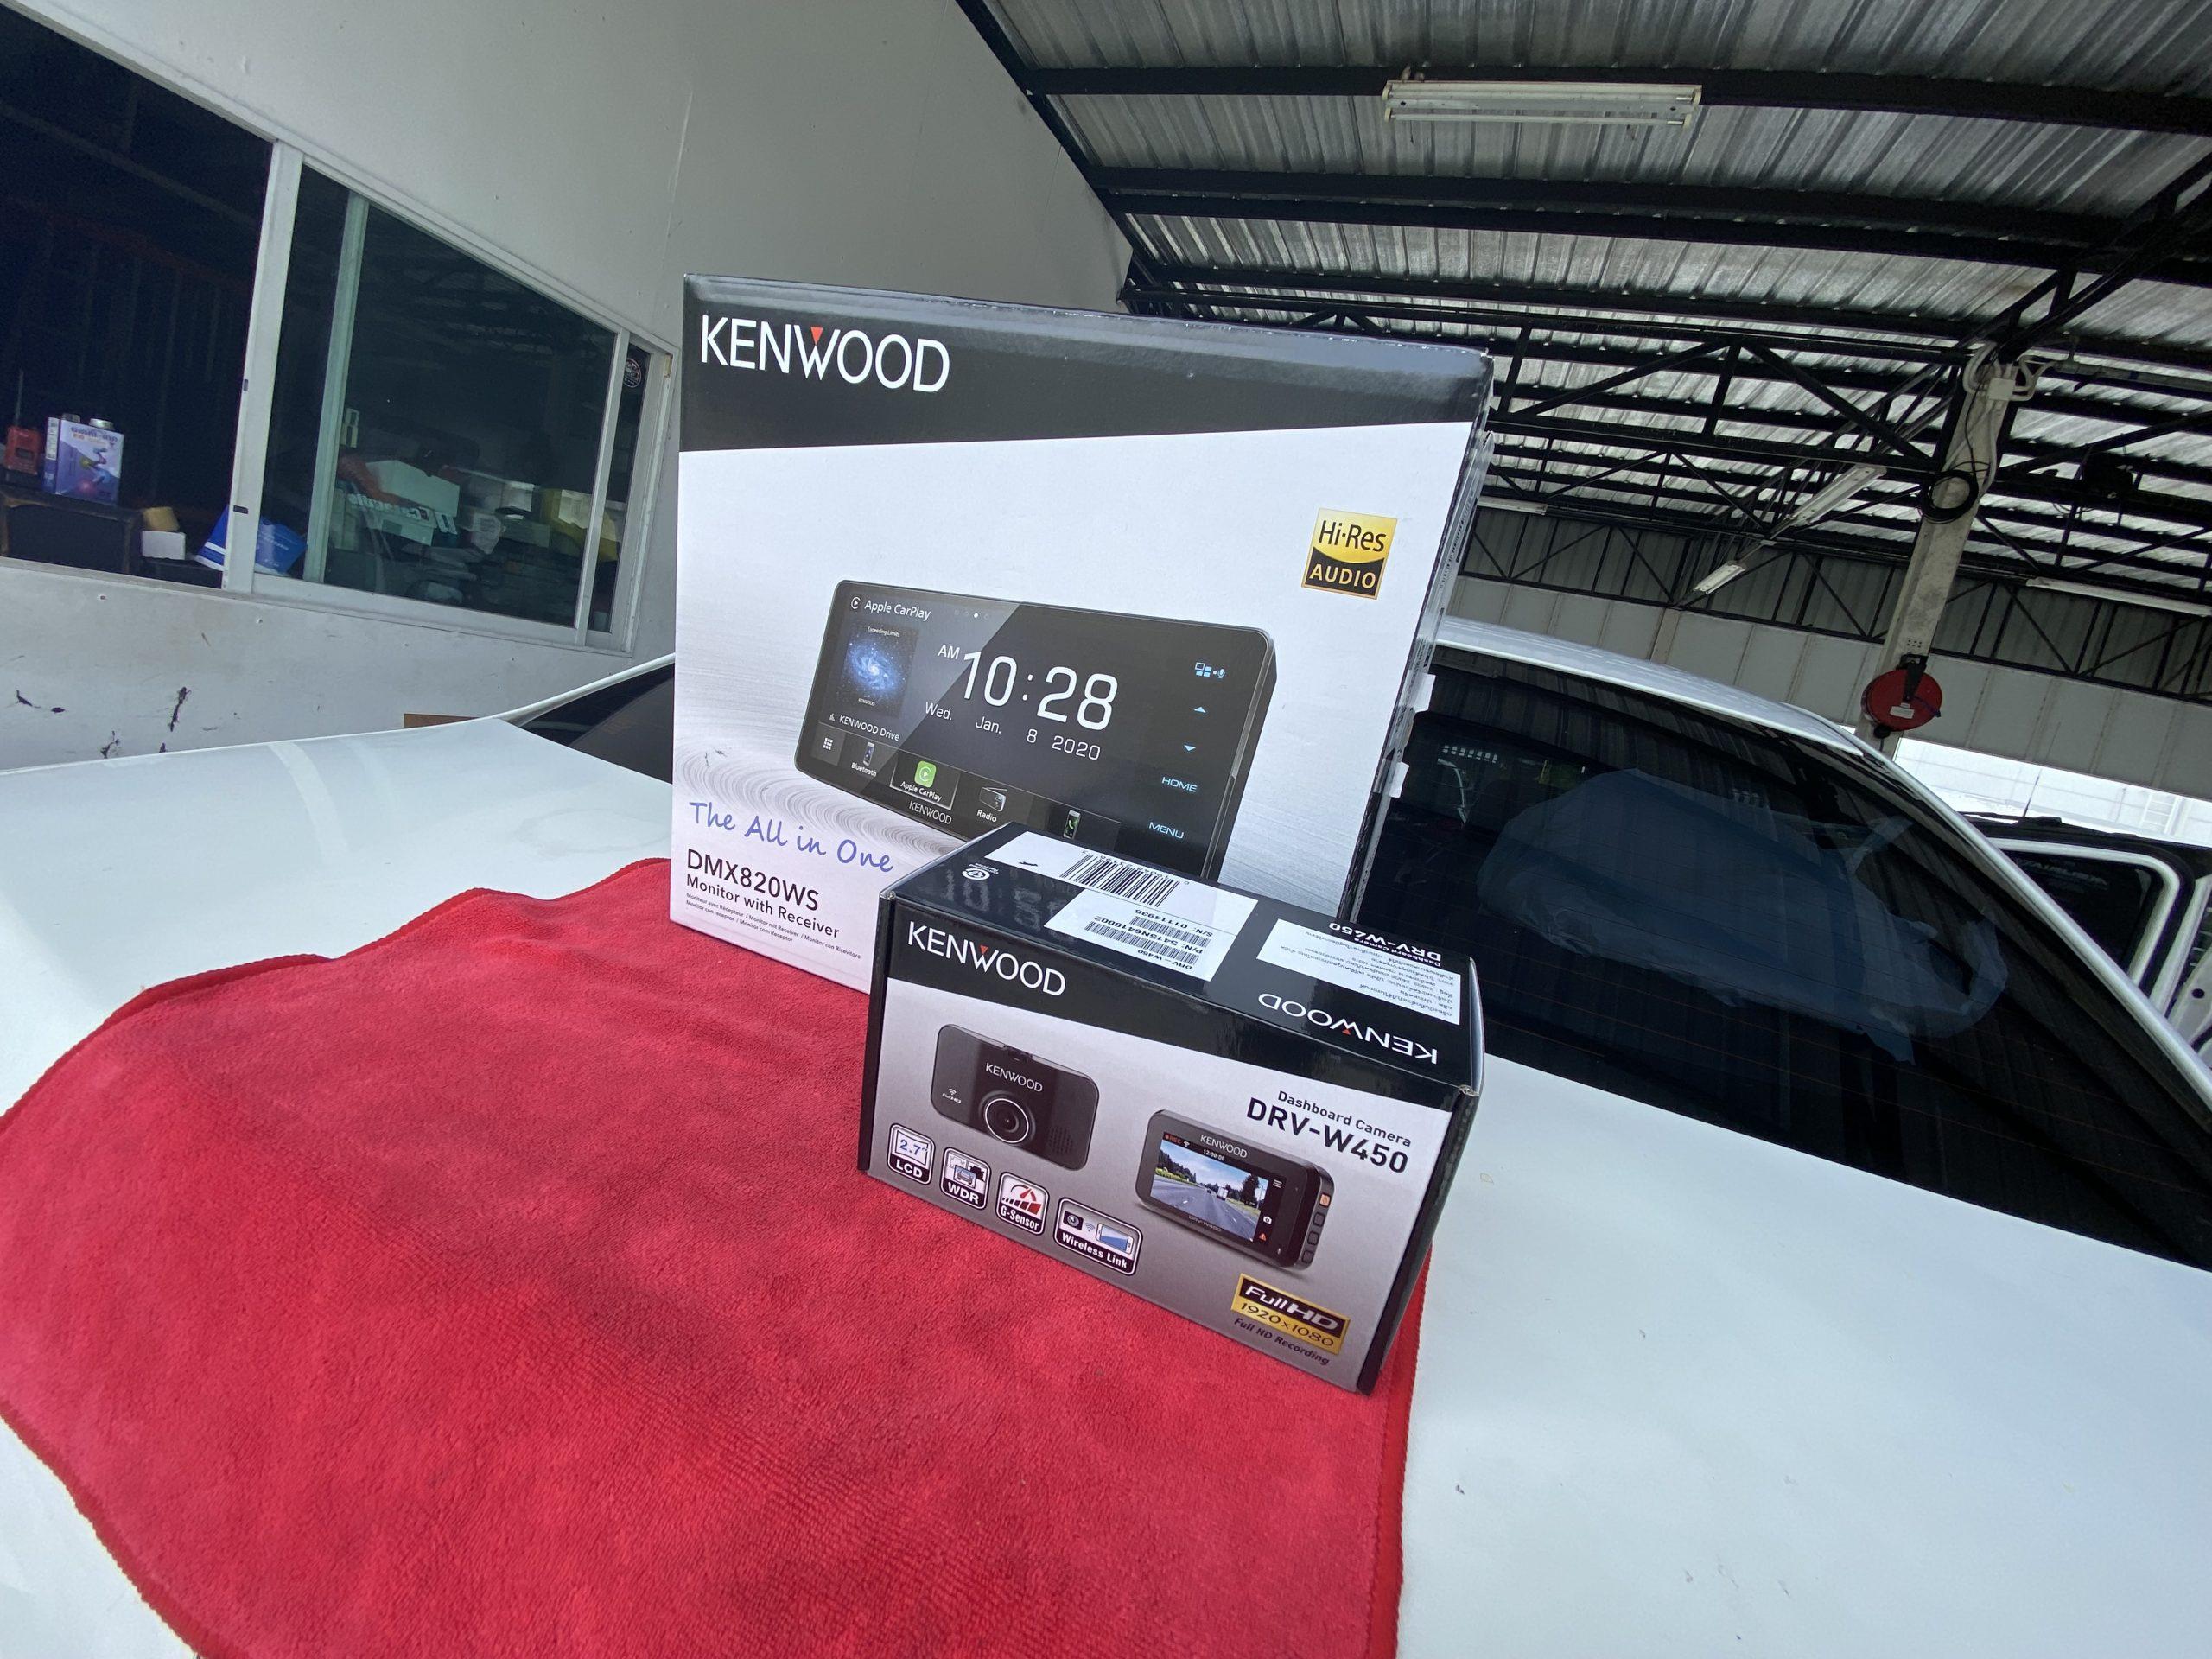 Toyota Vios มาจัดหน้าจอ Kenwood Dmx820ws หน้าจอเต็มกรอบ สวยงาม สบายตา